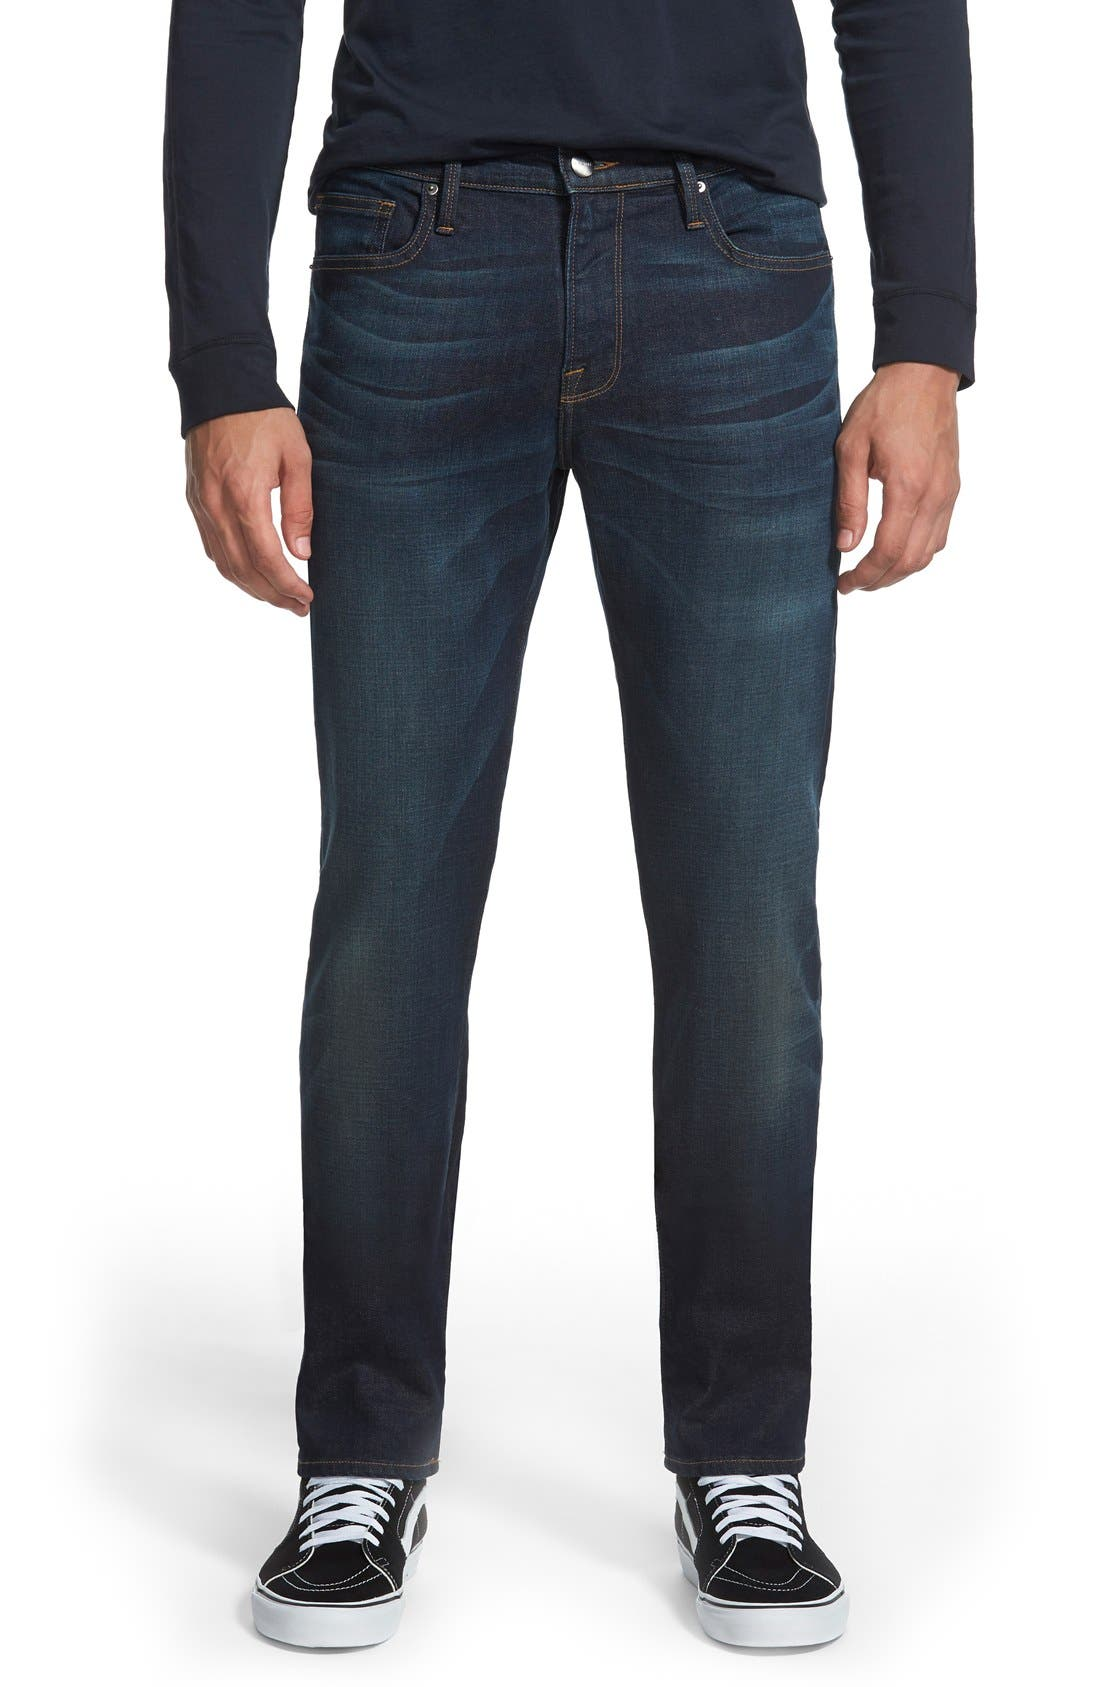 L'Homme Skinny Fit Jeans,                             Main thumbnail 1, color,                             Sierra